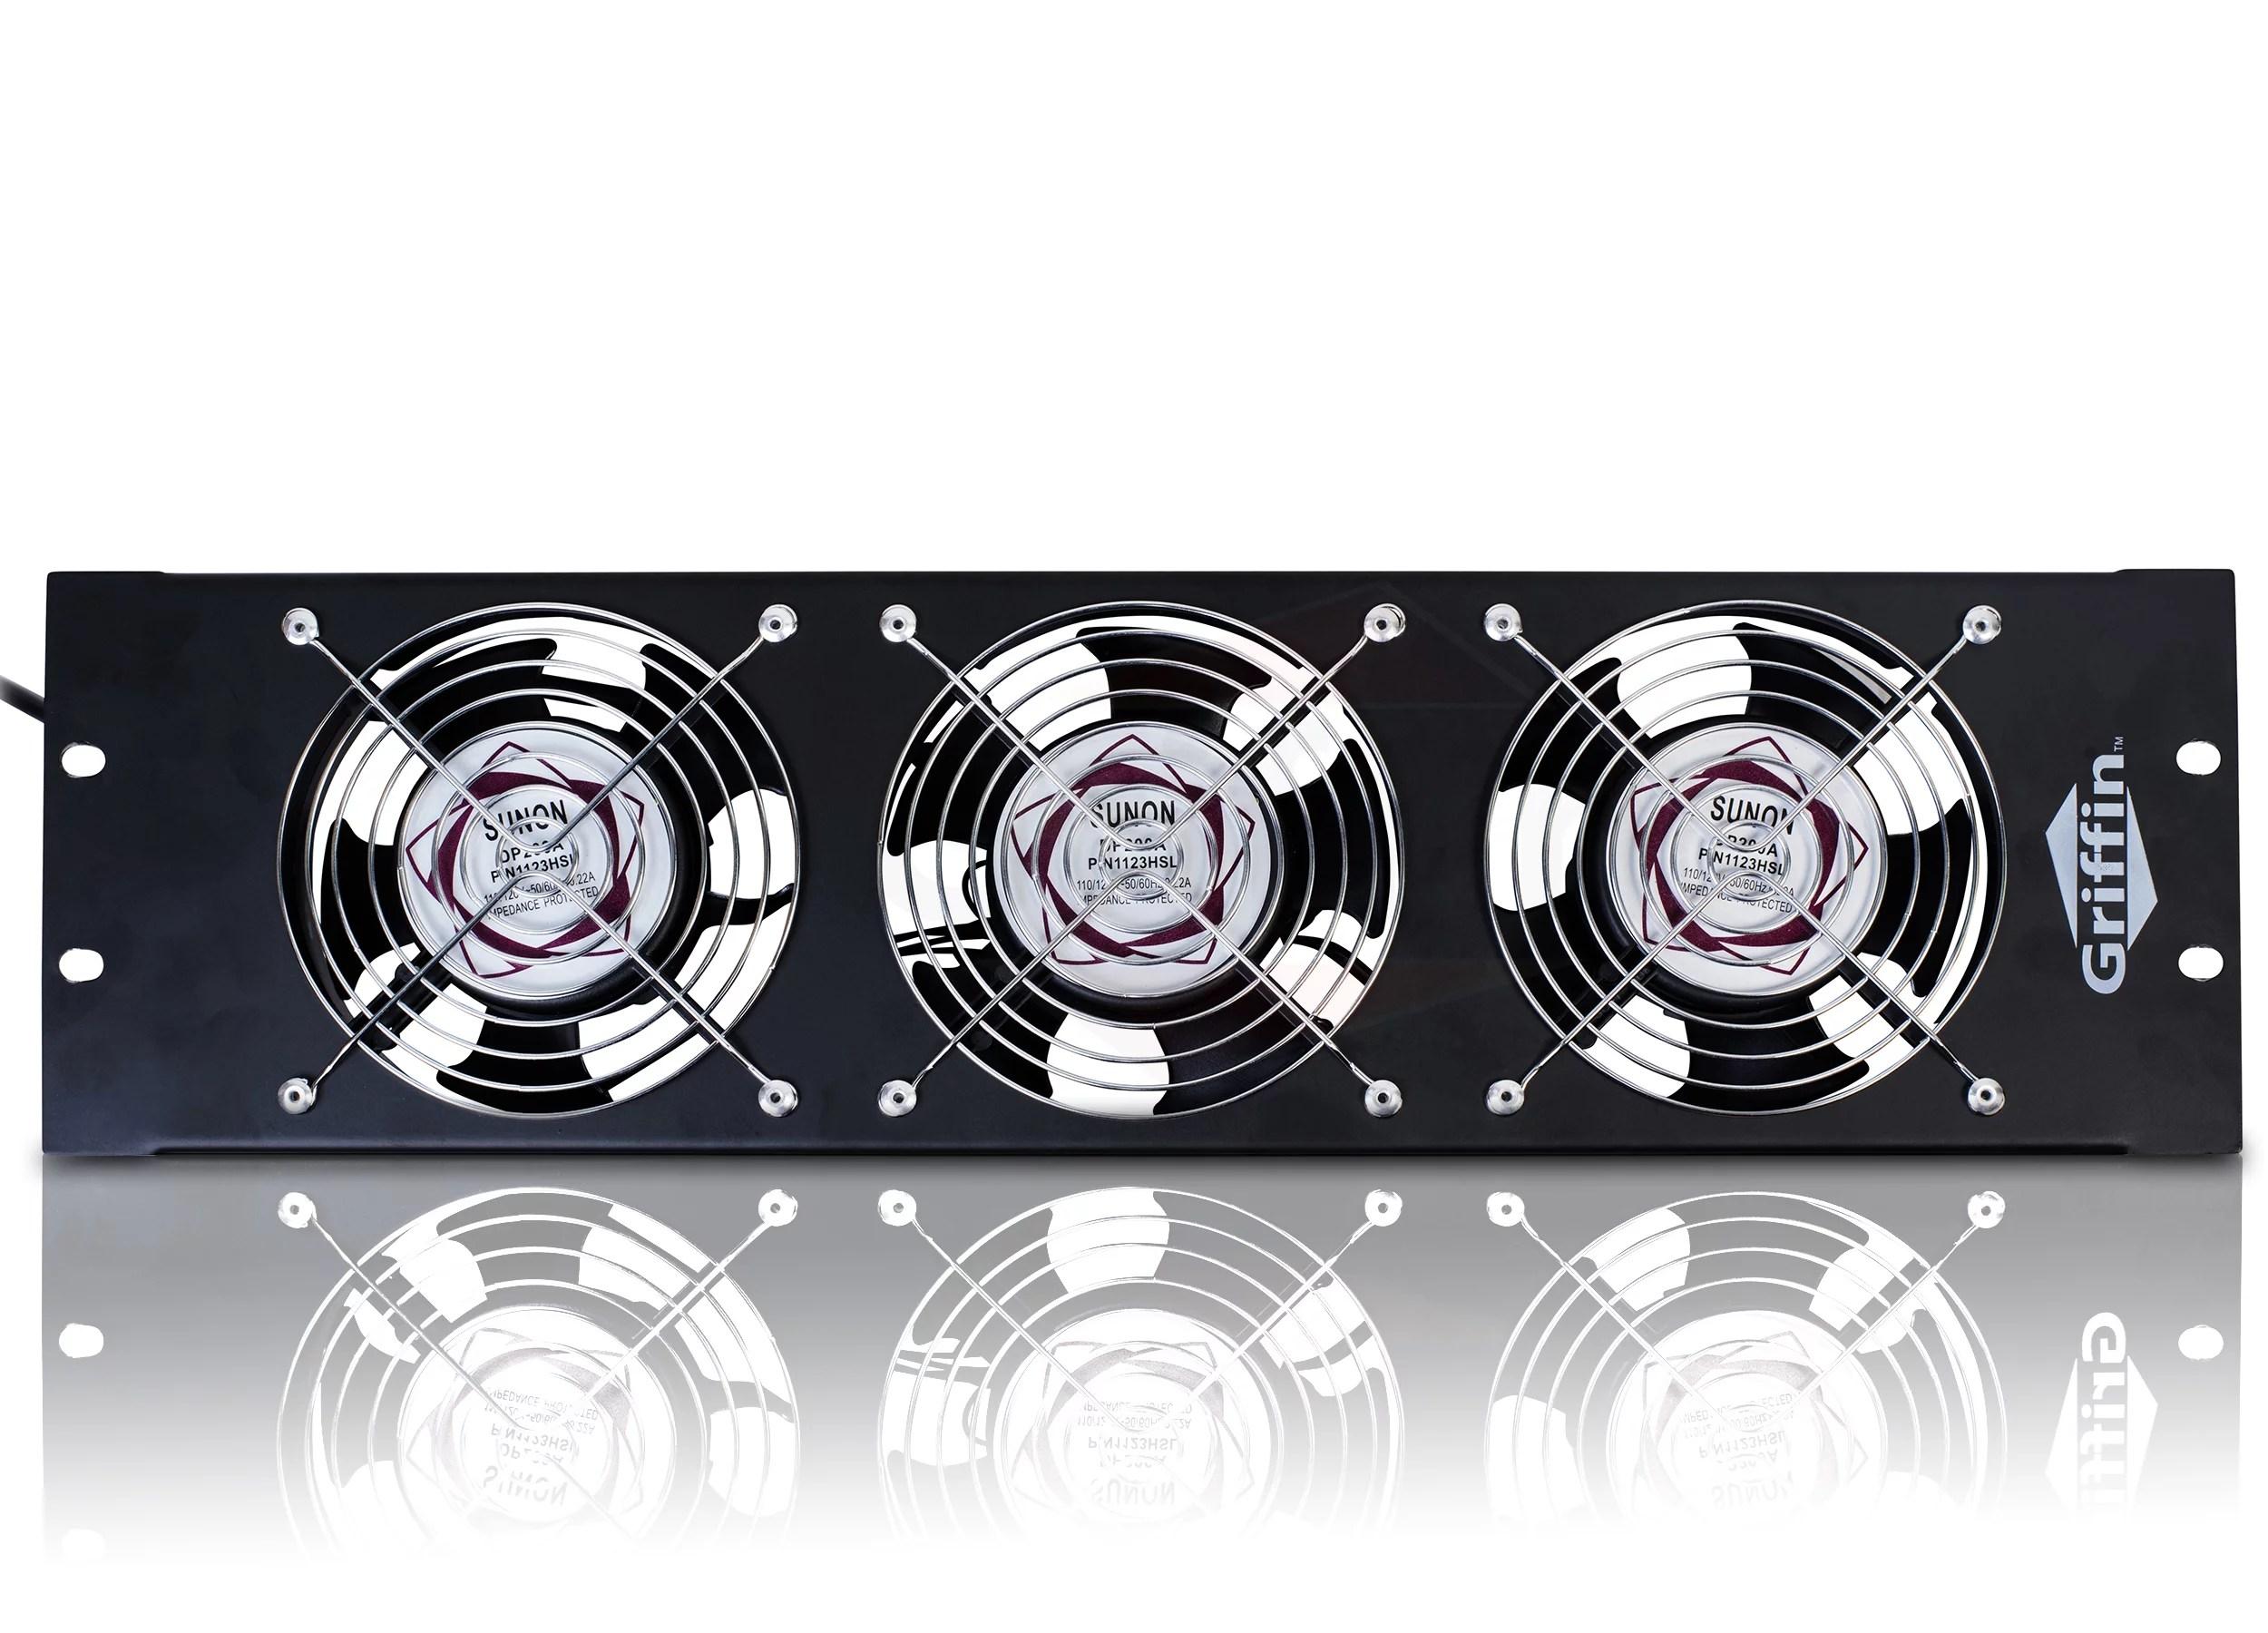 griffin rackmount cooling fan 3u ultra quiet triple exhaust fans keep studio audio equipment gear cool rack mount on network it system server rails